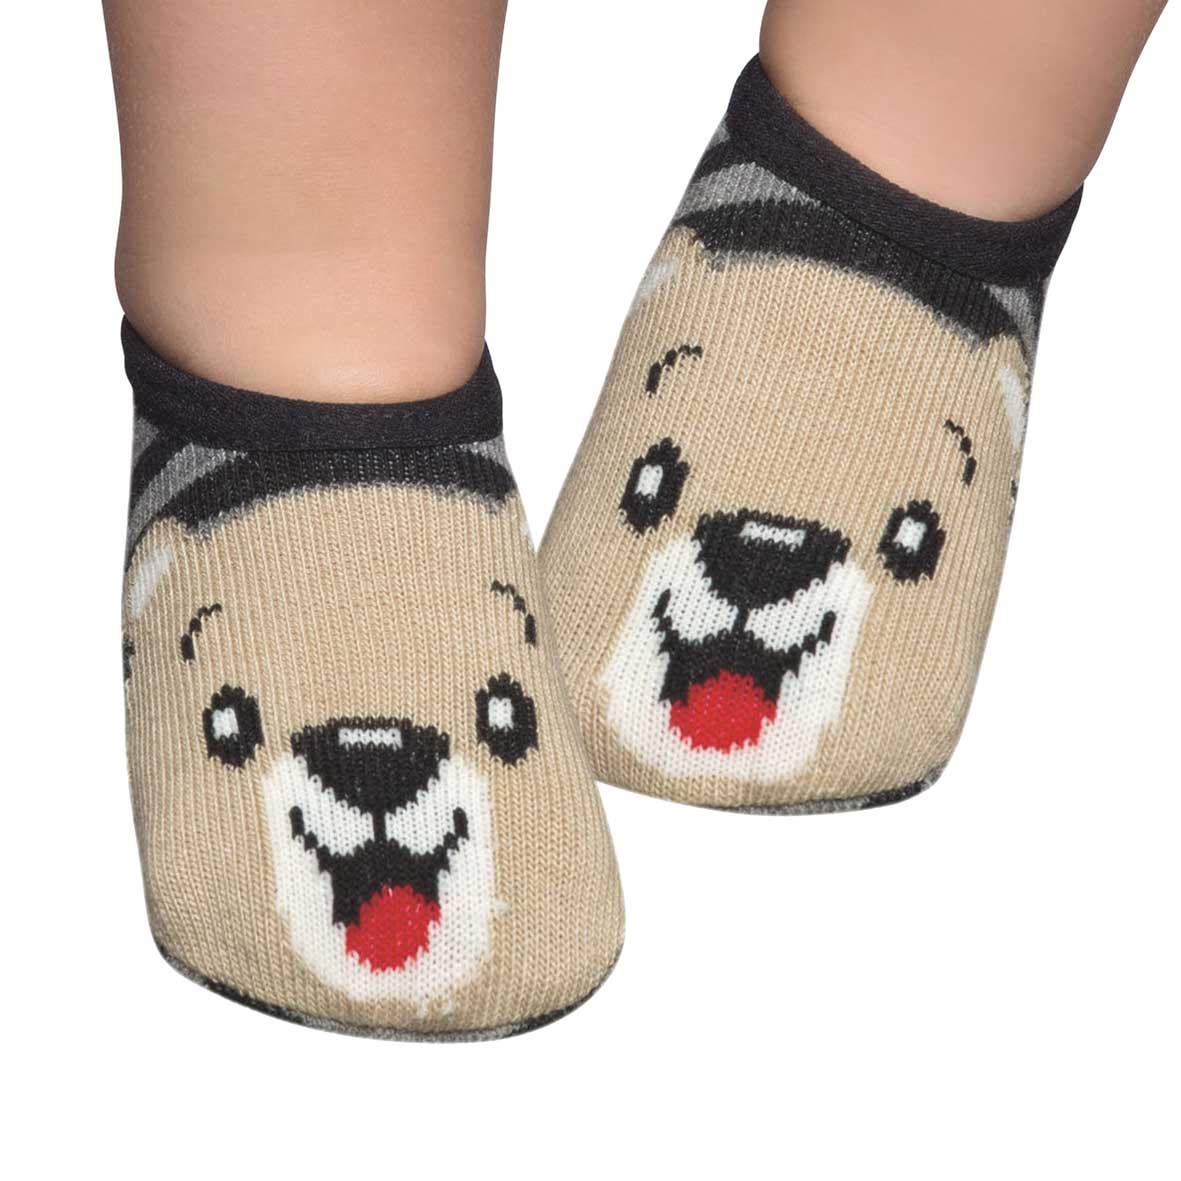 Meia Sapatilha Mescla Urso Bege (0-12 meses)   PUKET